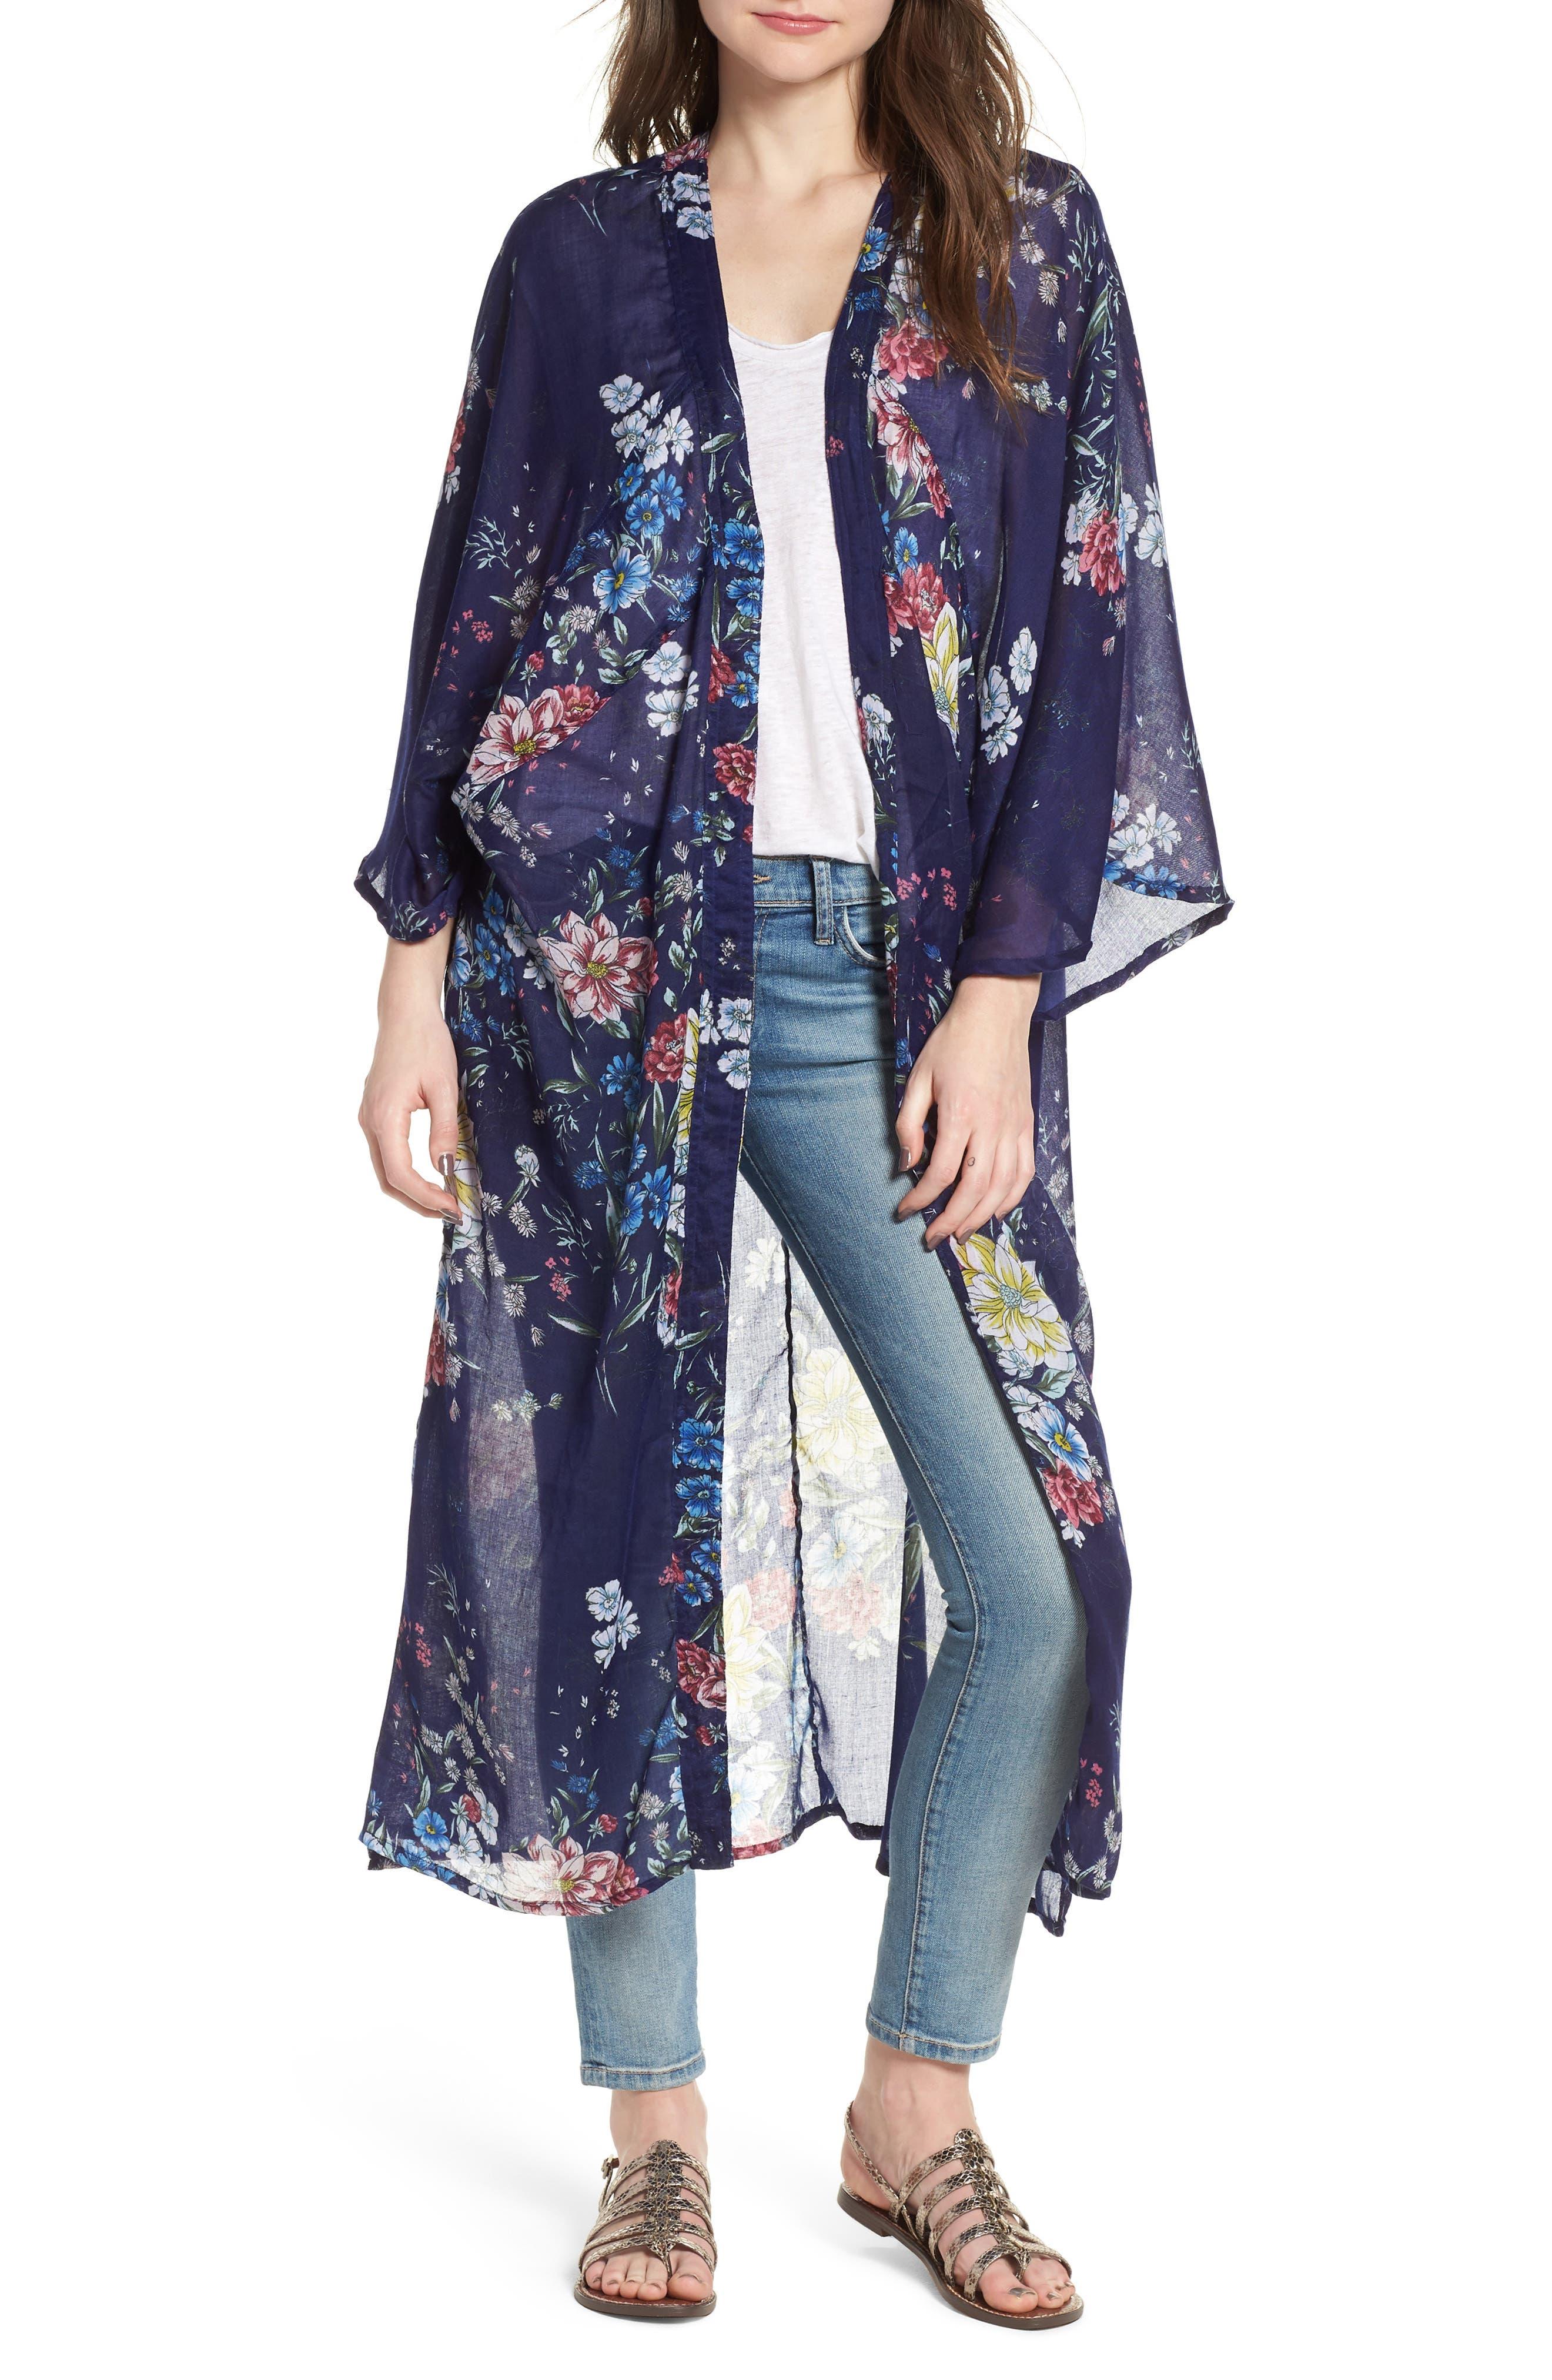 STEVE MADDEN,                             Floral Kimono Duster,                             Main thumbnail 1, color,                             410